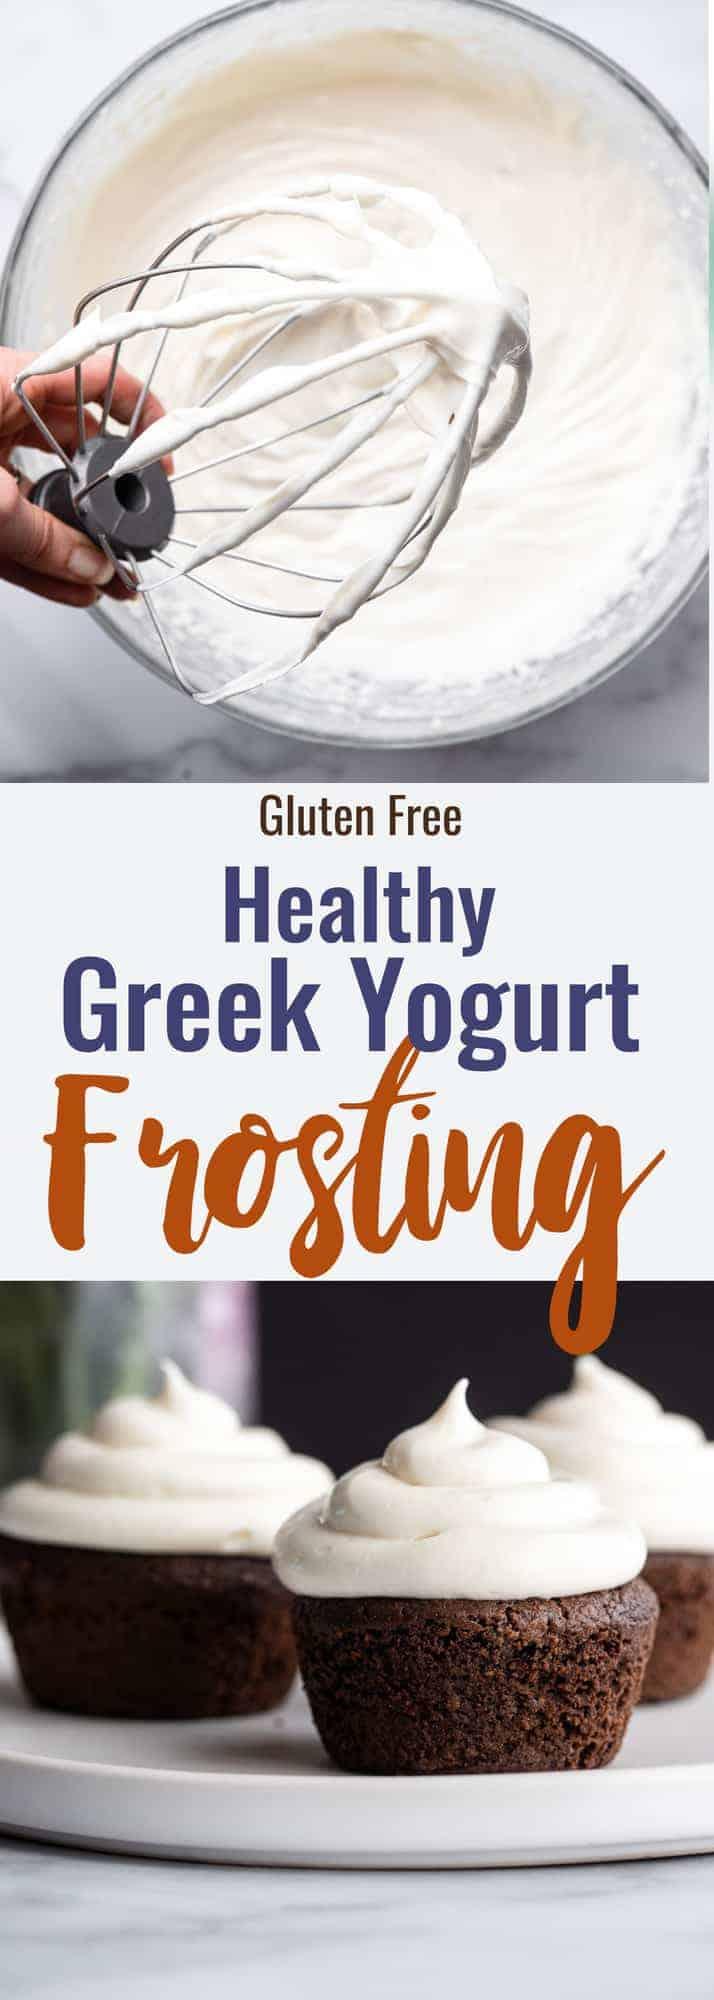 Greek yogurt cream cheese frosting